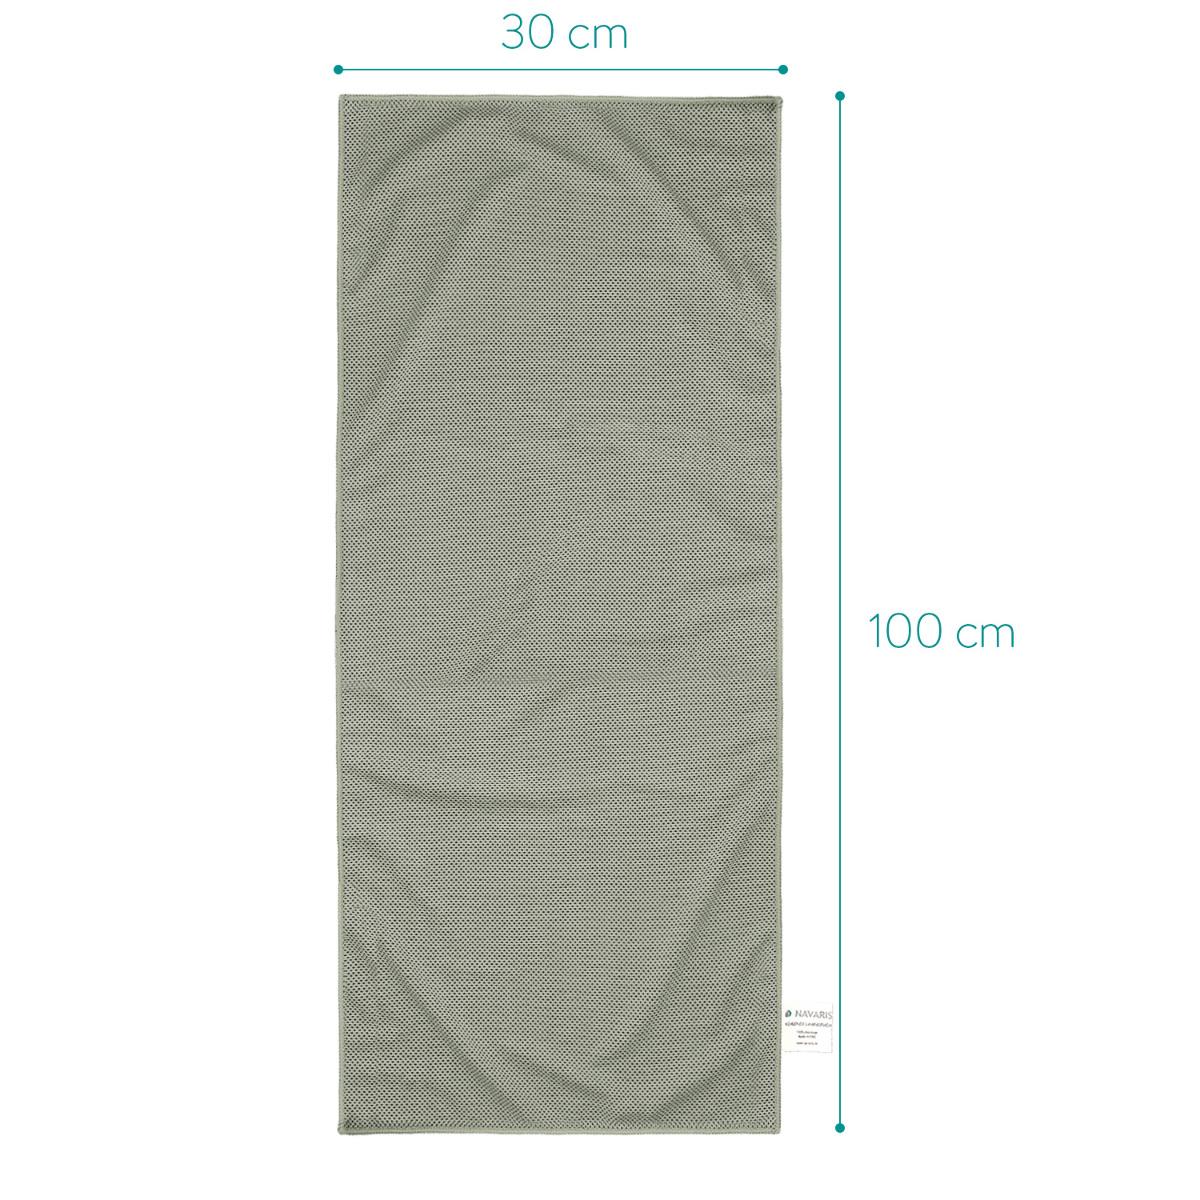 2x k hlendes sporthandtuch aus microfaser sport tuch. Black Bedroom Furniture Sets. Home Design Ideas